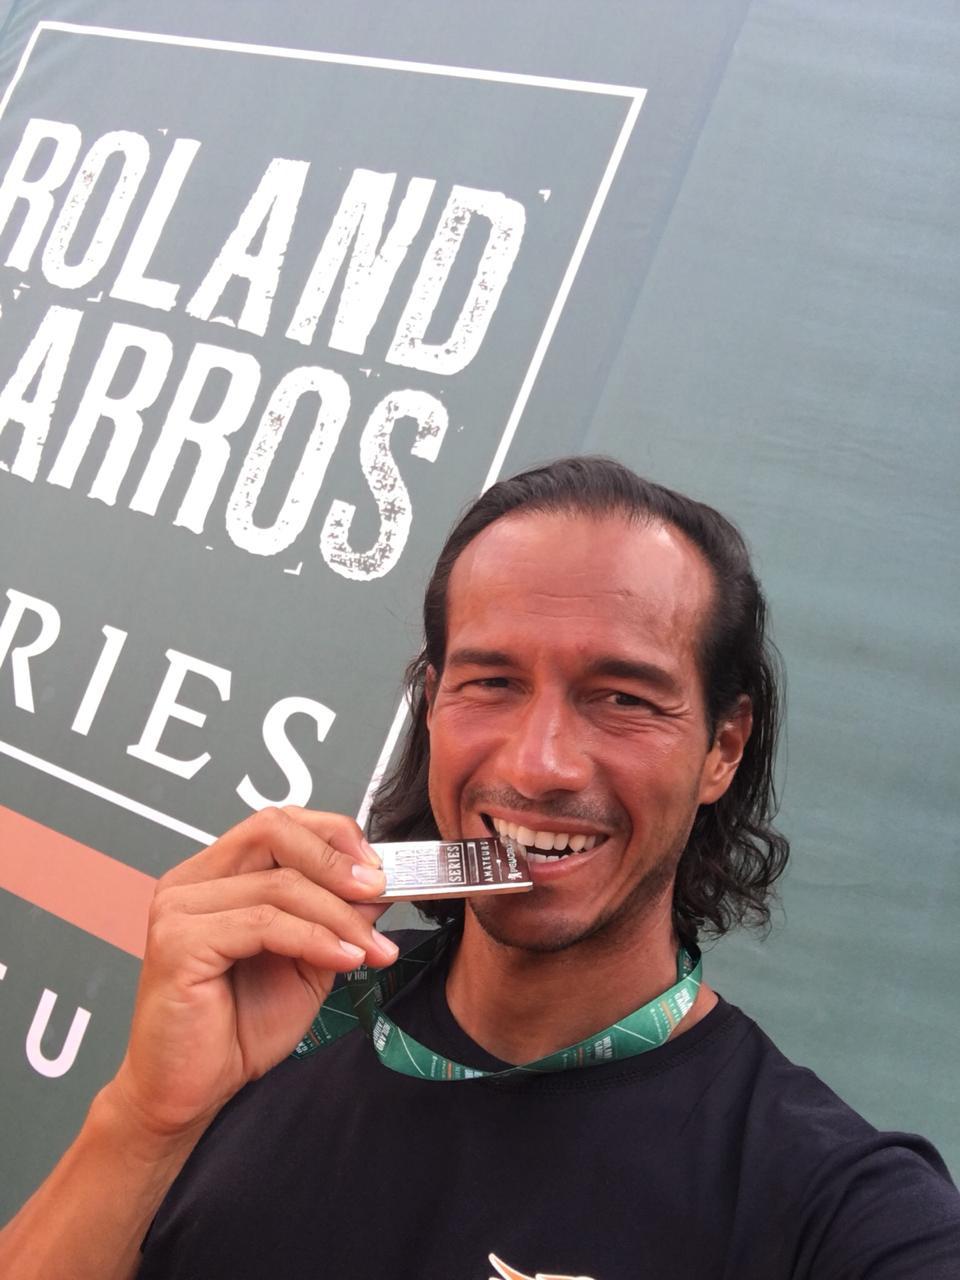 Máster do Roland-Garros Amateur Series by Peugeot reúne, no Rio, mais de 100 tenistas de 9 estados